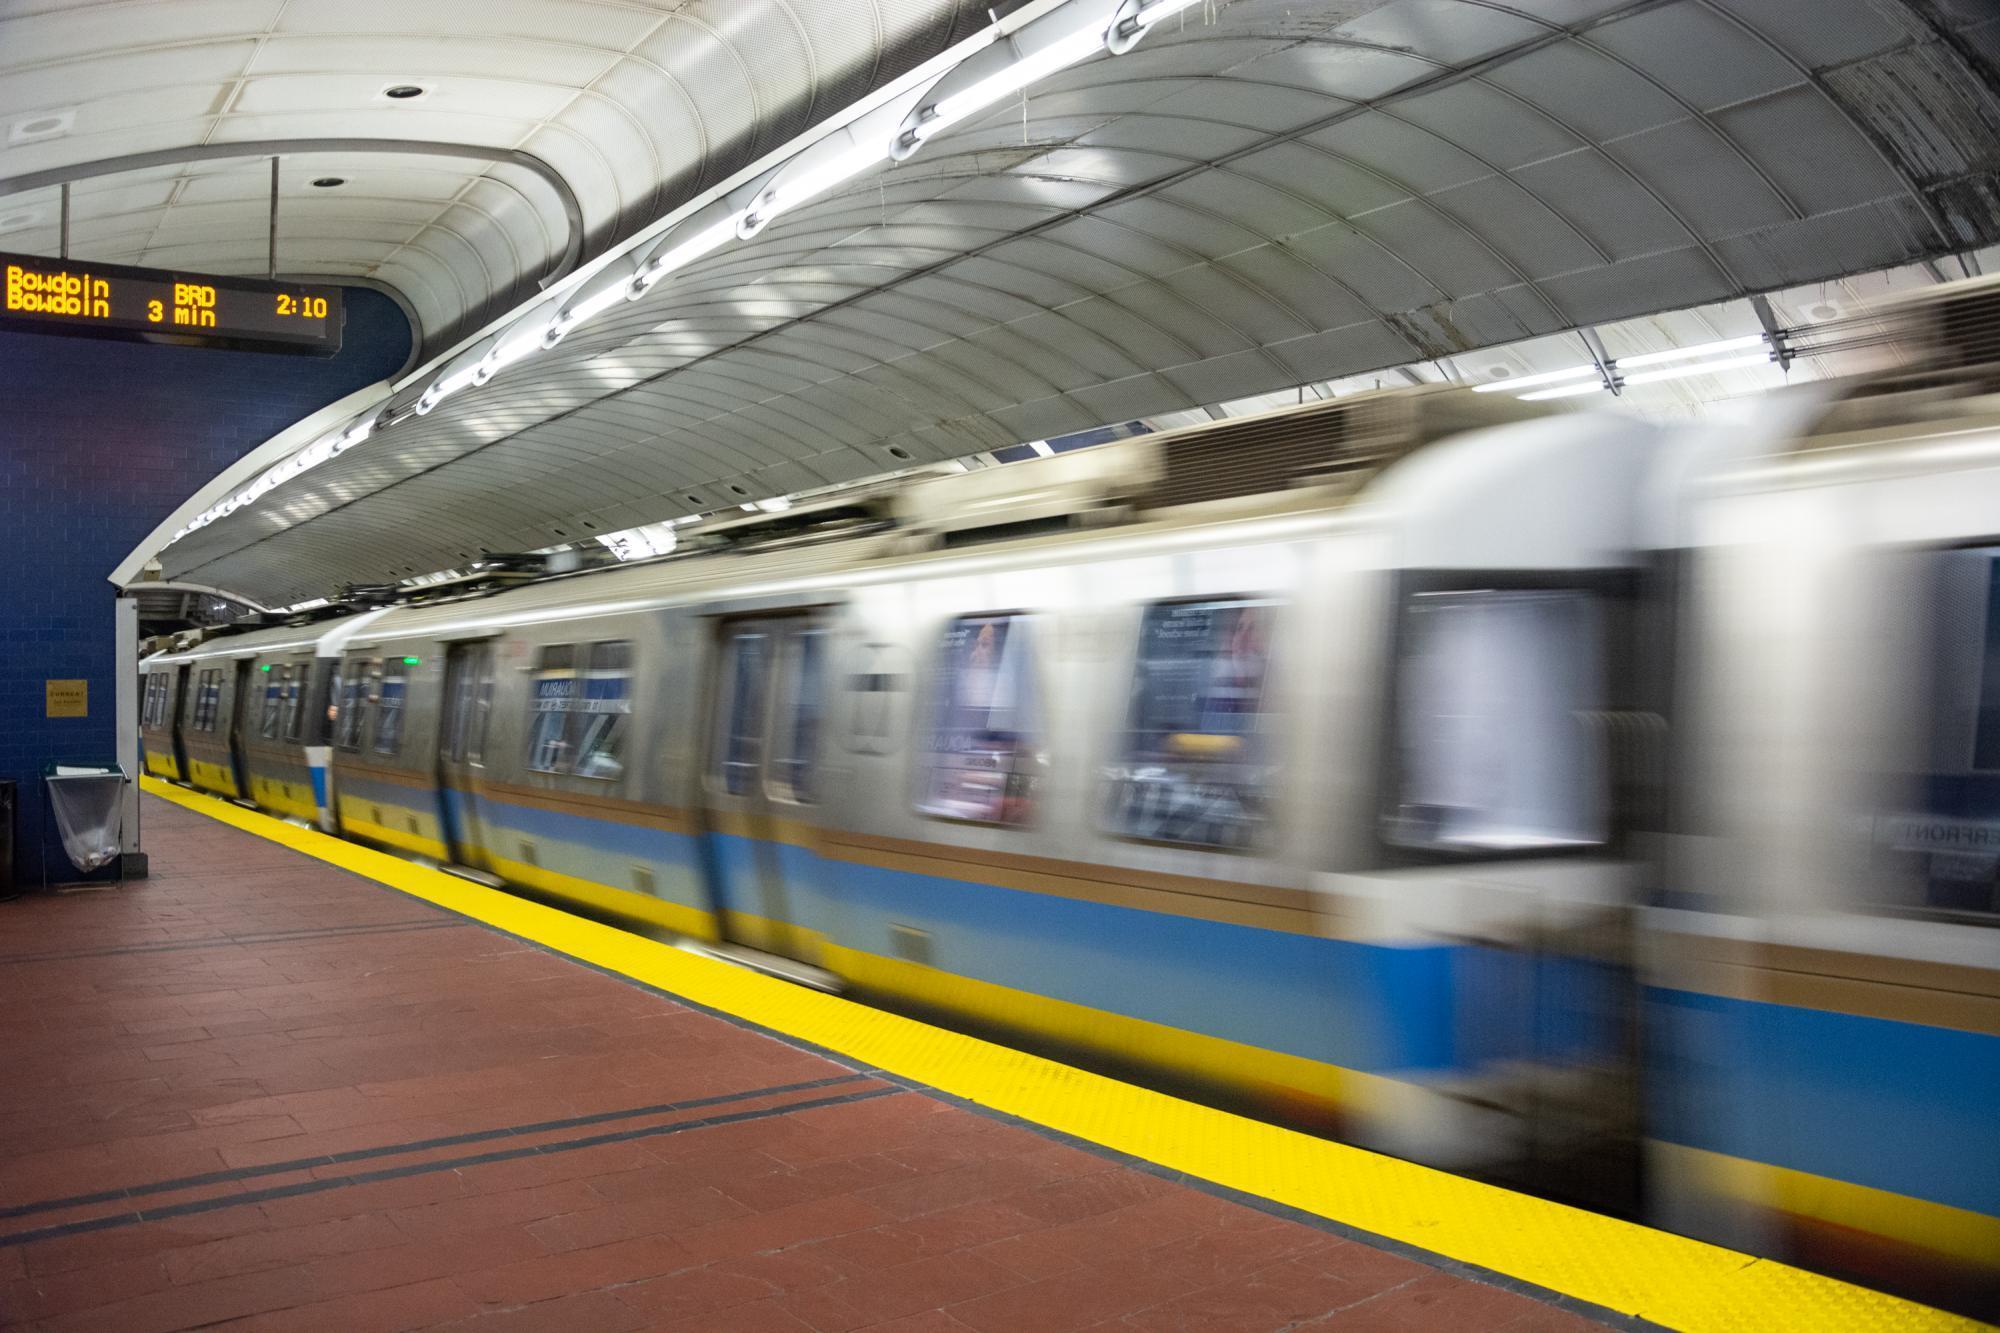 A Blue Line train passes through Aquarium station